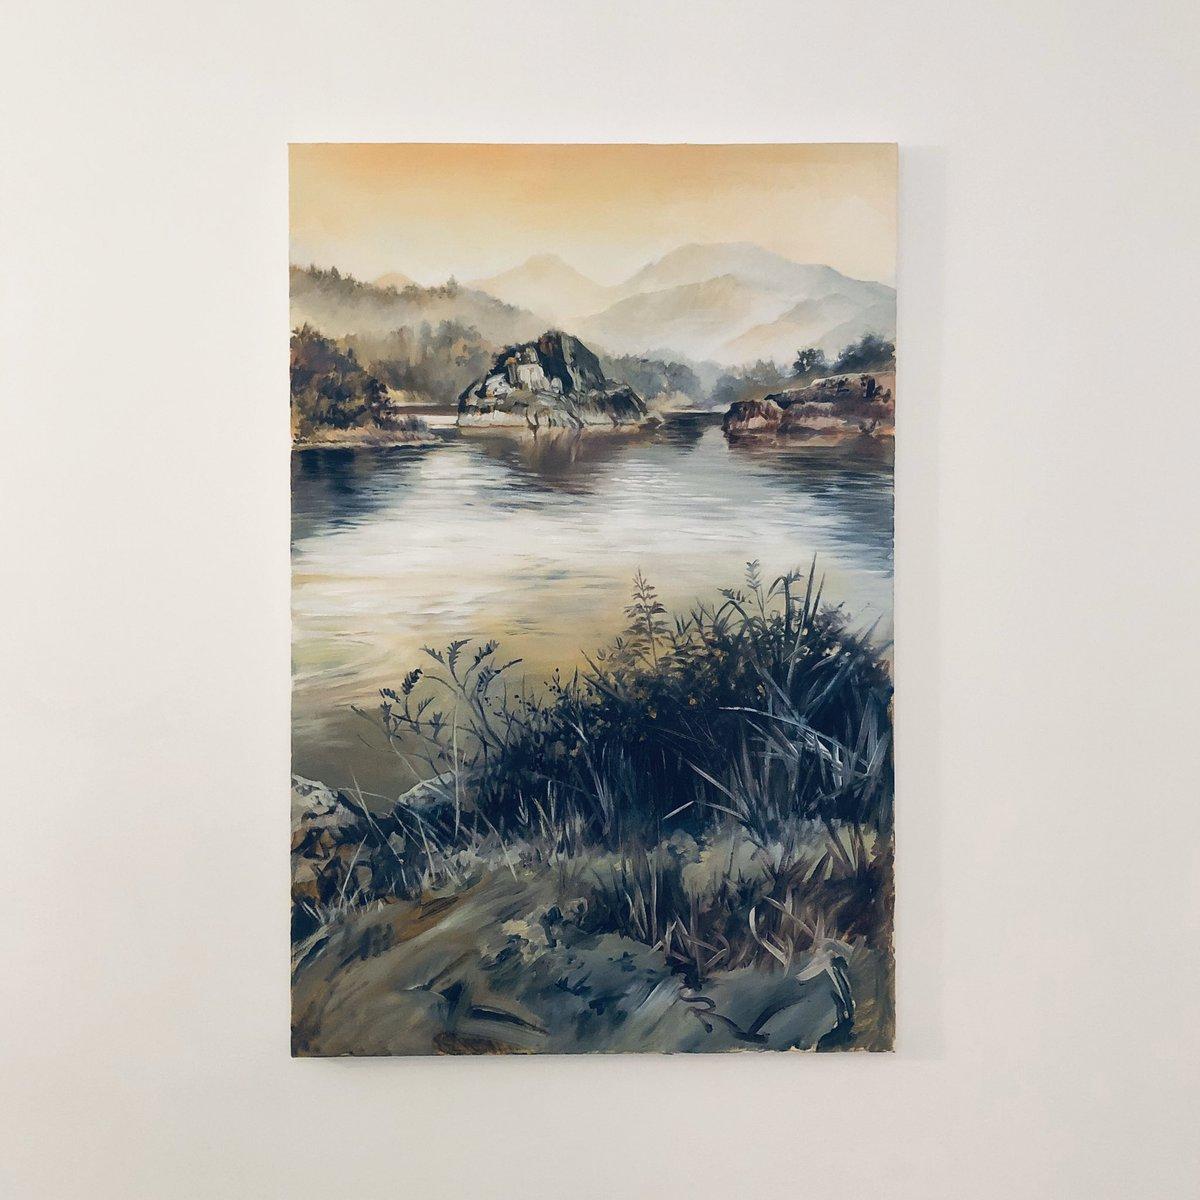 Chatterley Whitfield ltd print landscape artist of the year finalist John Ball